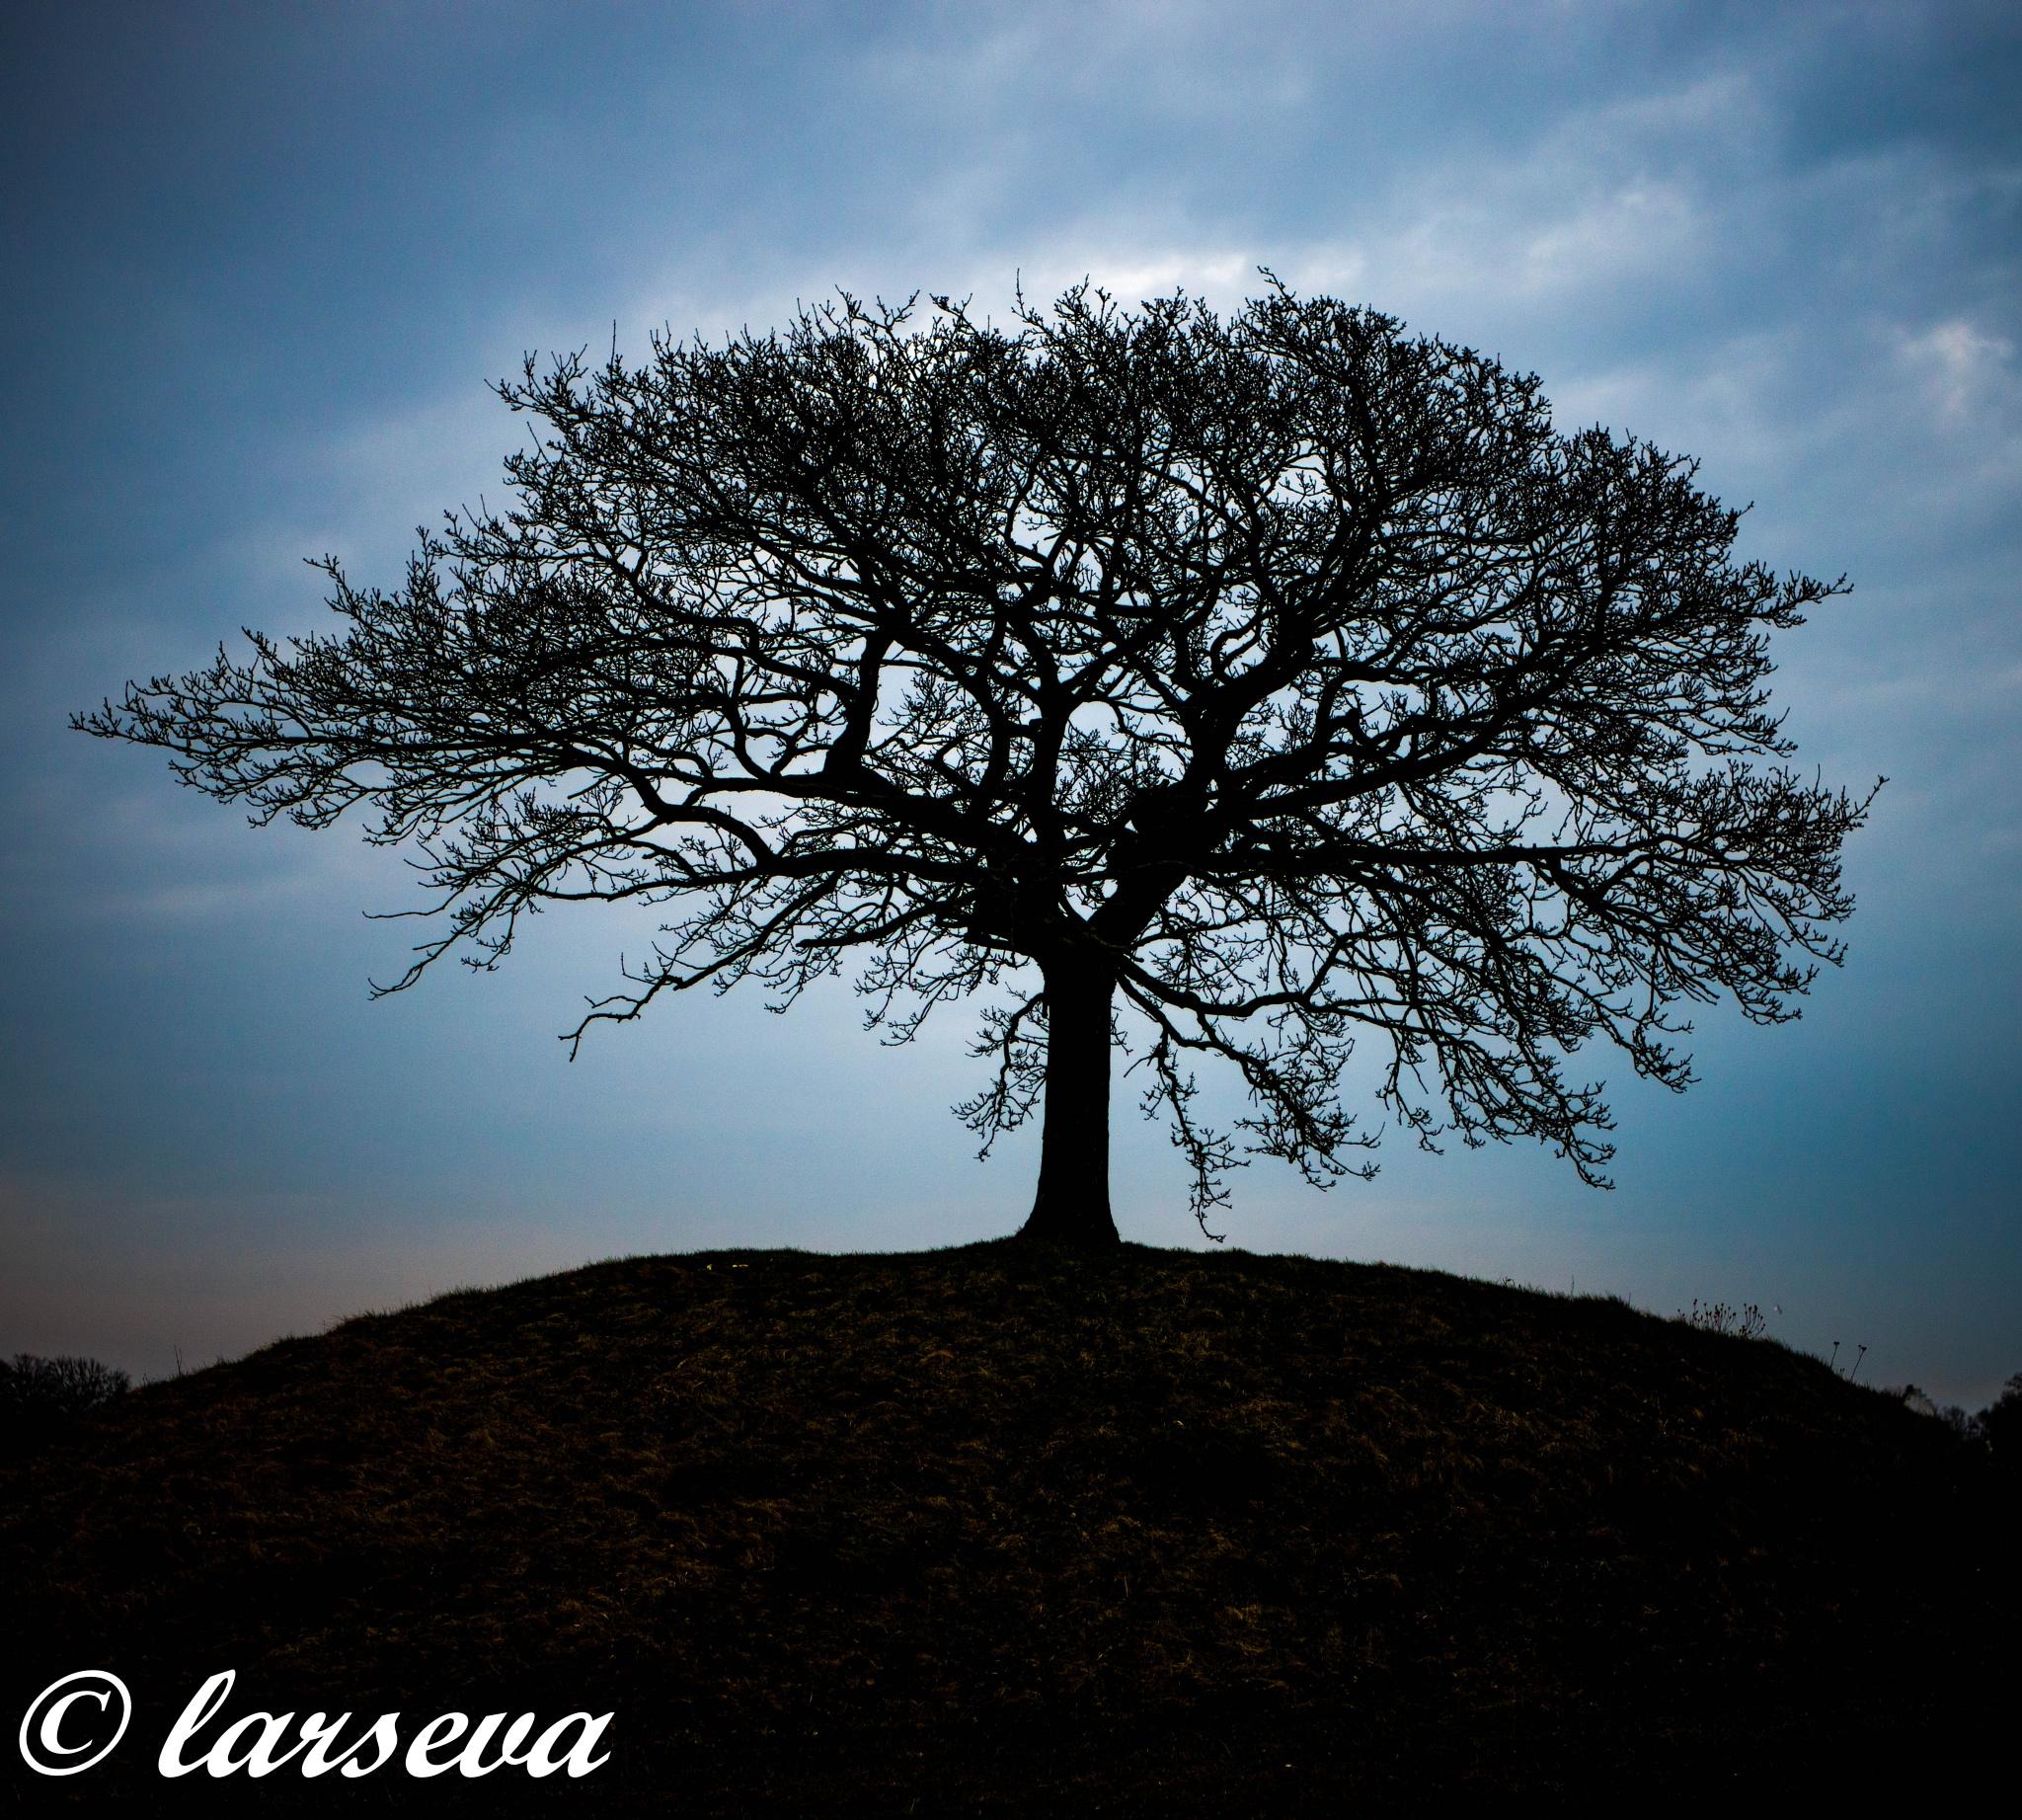 a lonley tree by lars-goran6